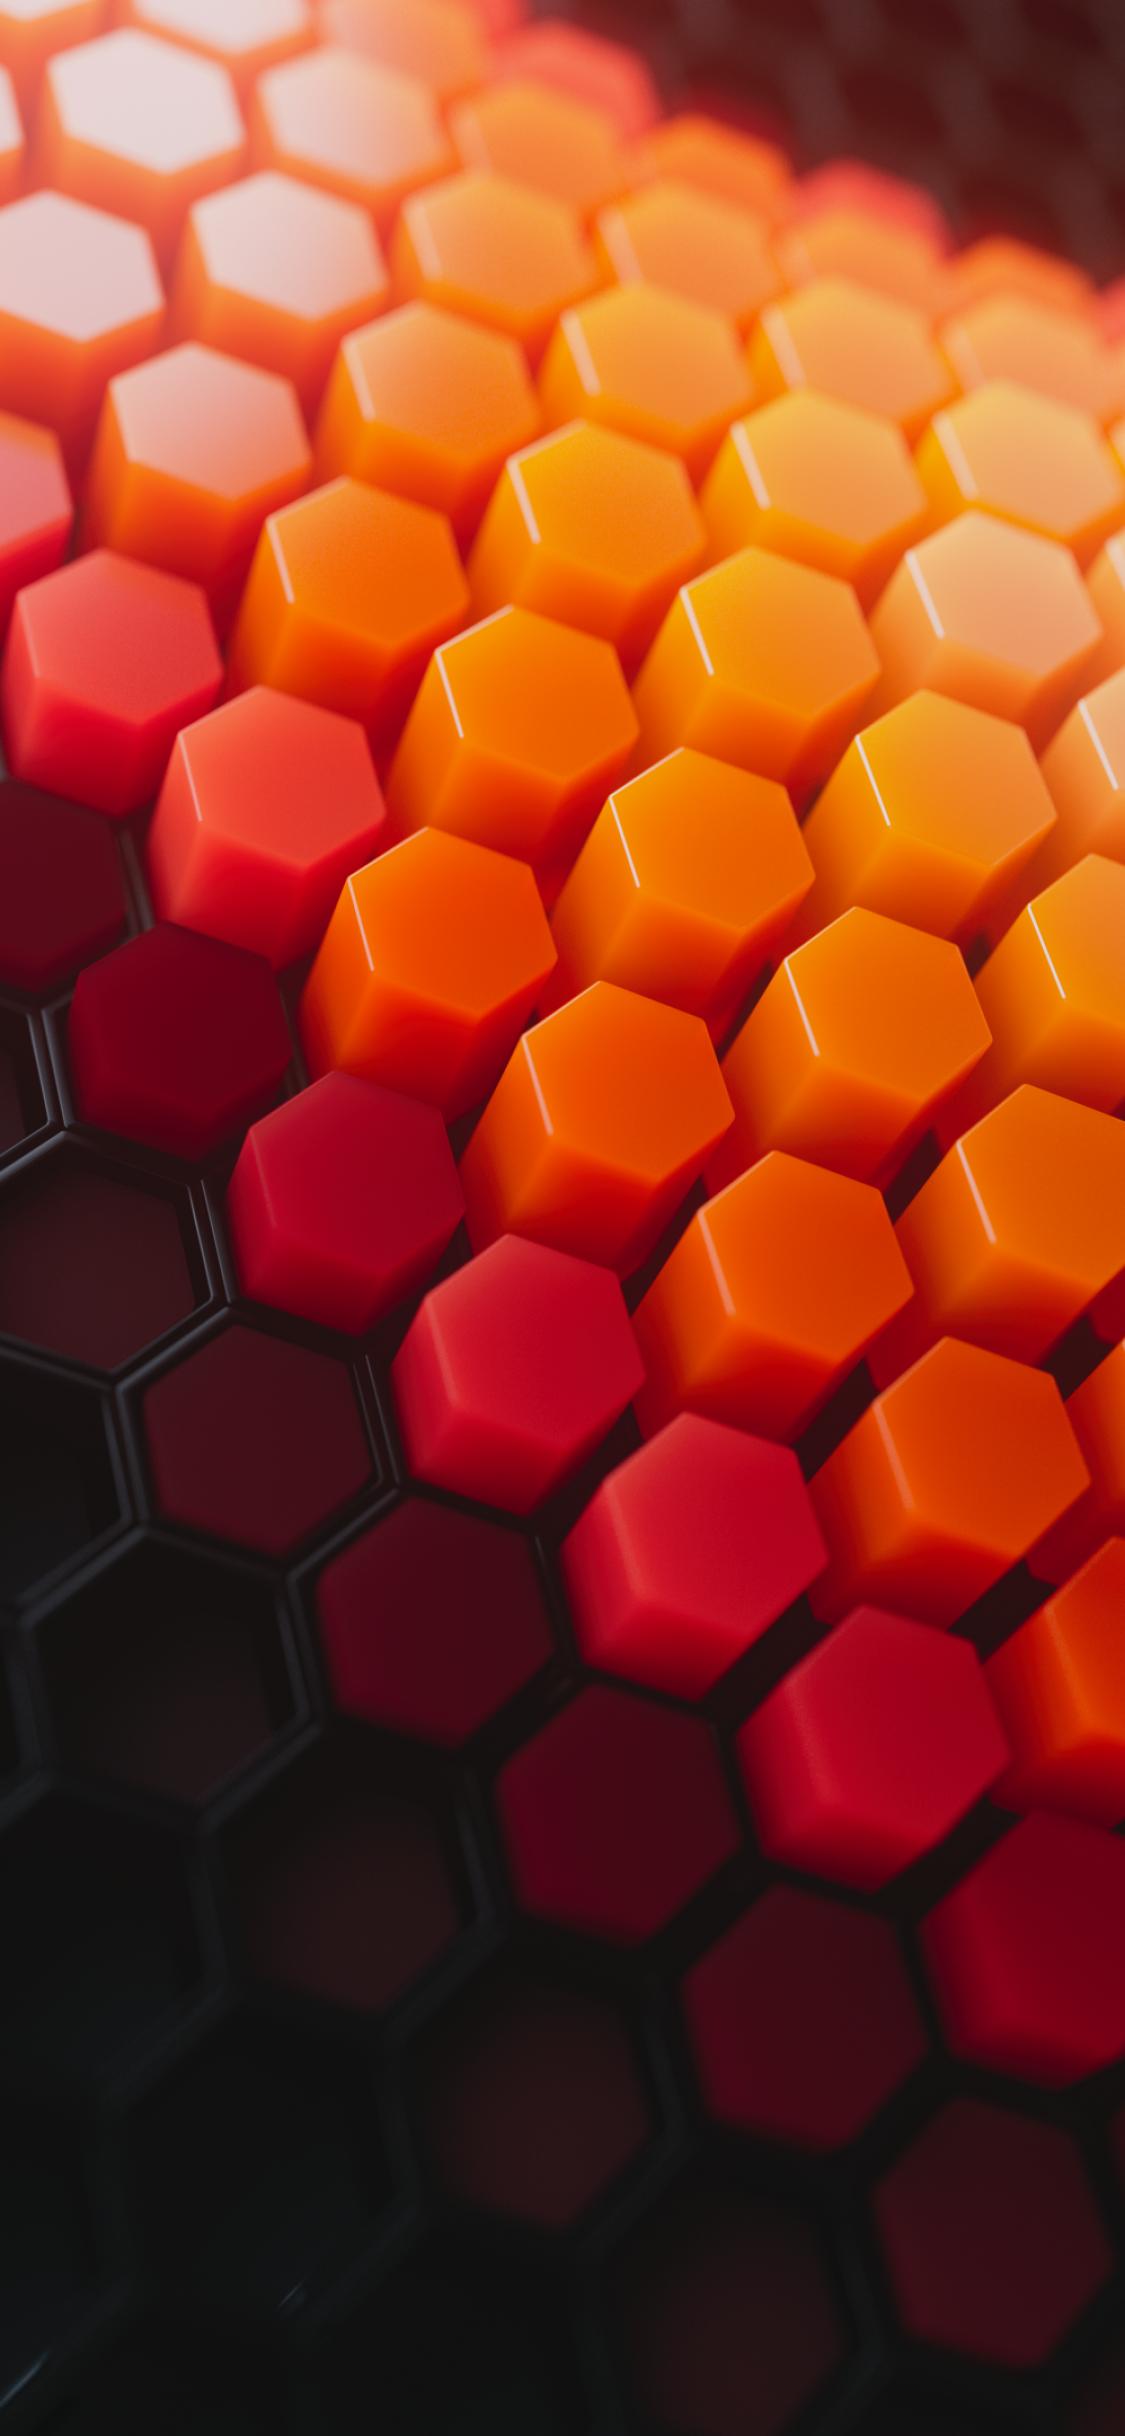 Hexagons 4K Wallpaper Patterns Orange background Orange